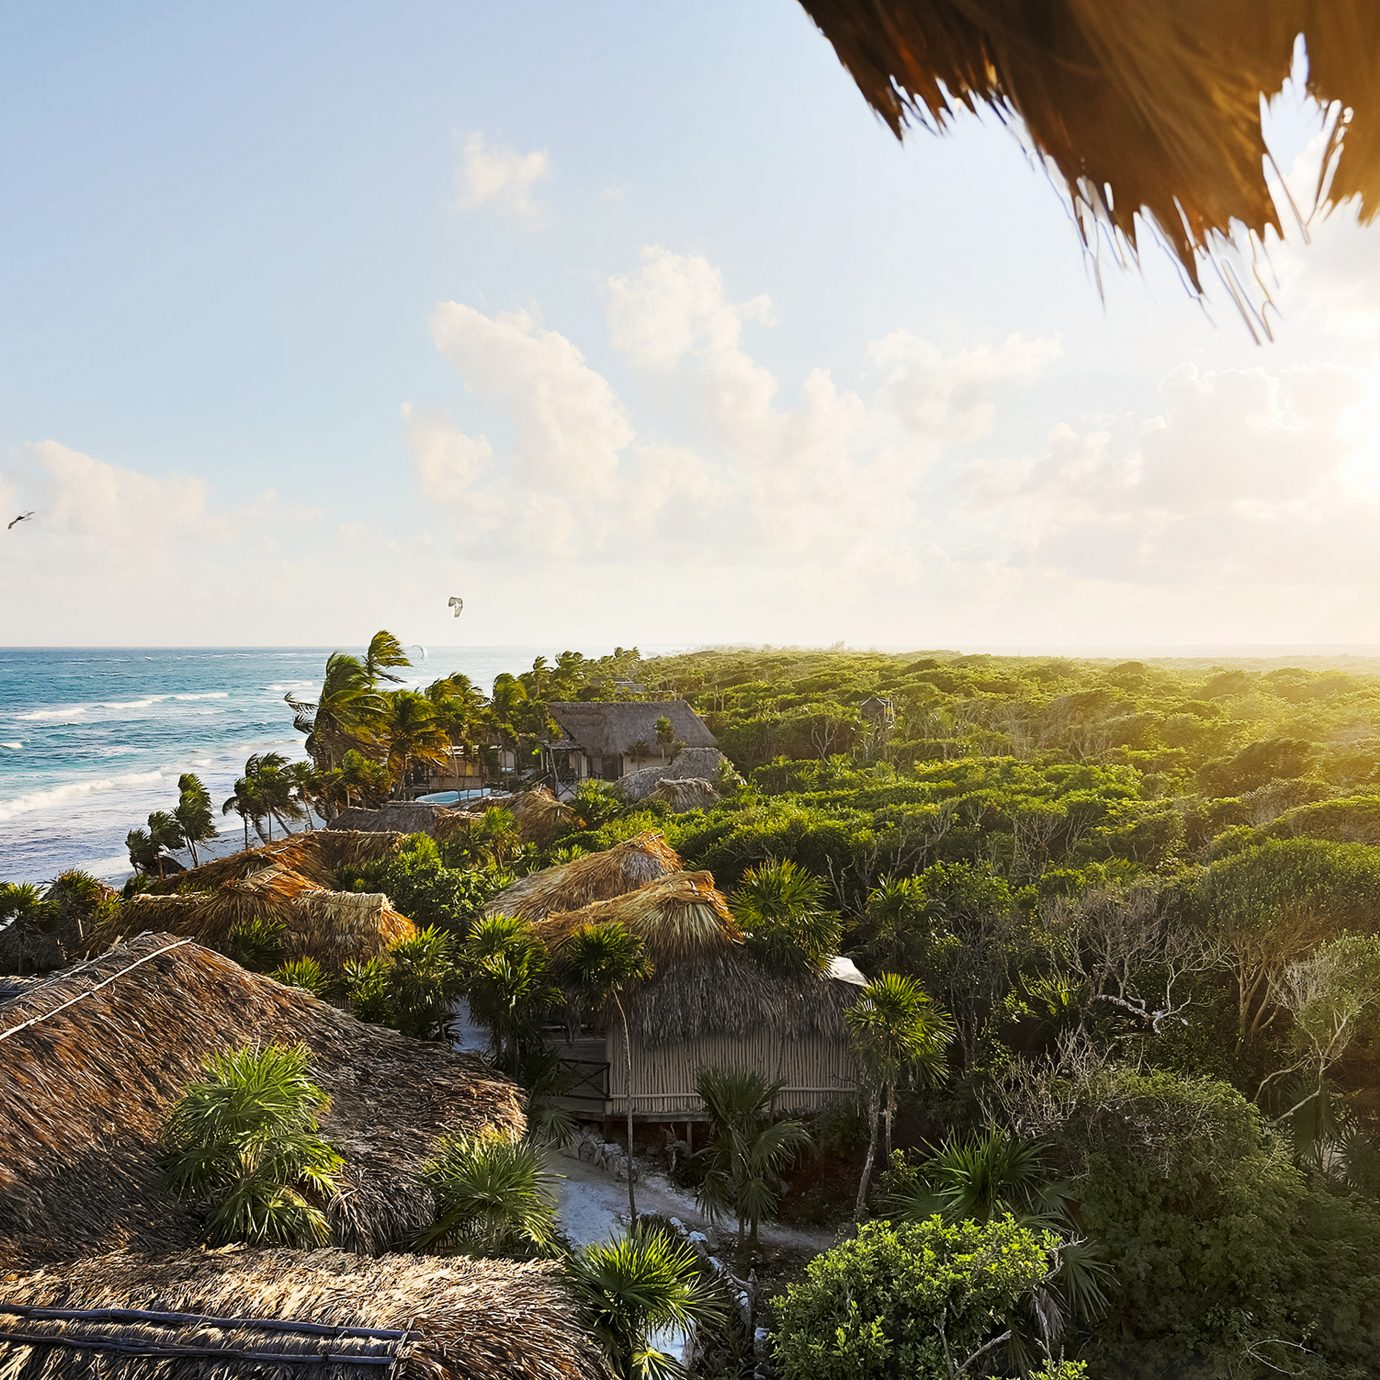 Beachfront Eco Grounds Hotels Island sky Nature Coast Sea tree ecosystem horizon Ocean shore morning rock sunlight landscape cliff terrain arecales tropics